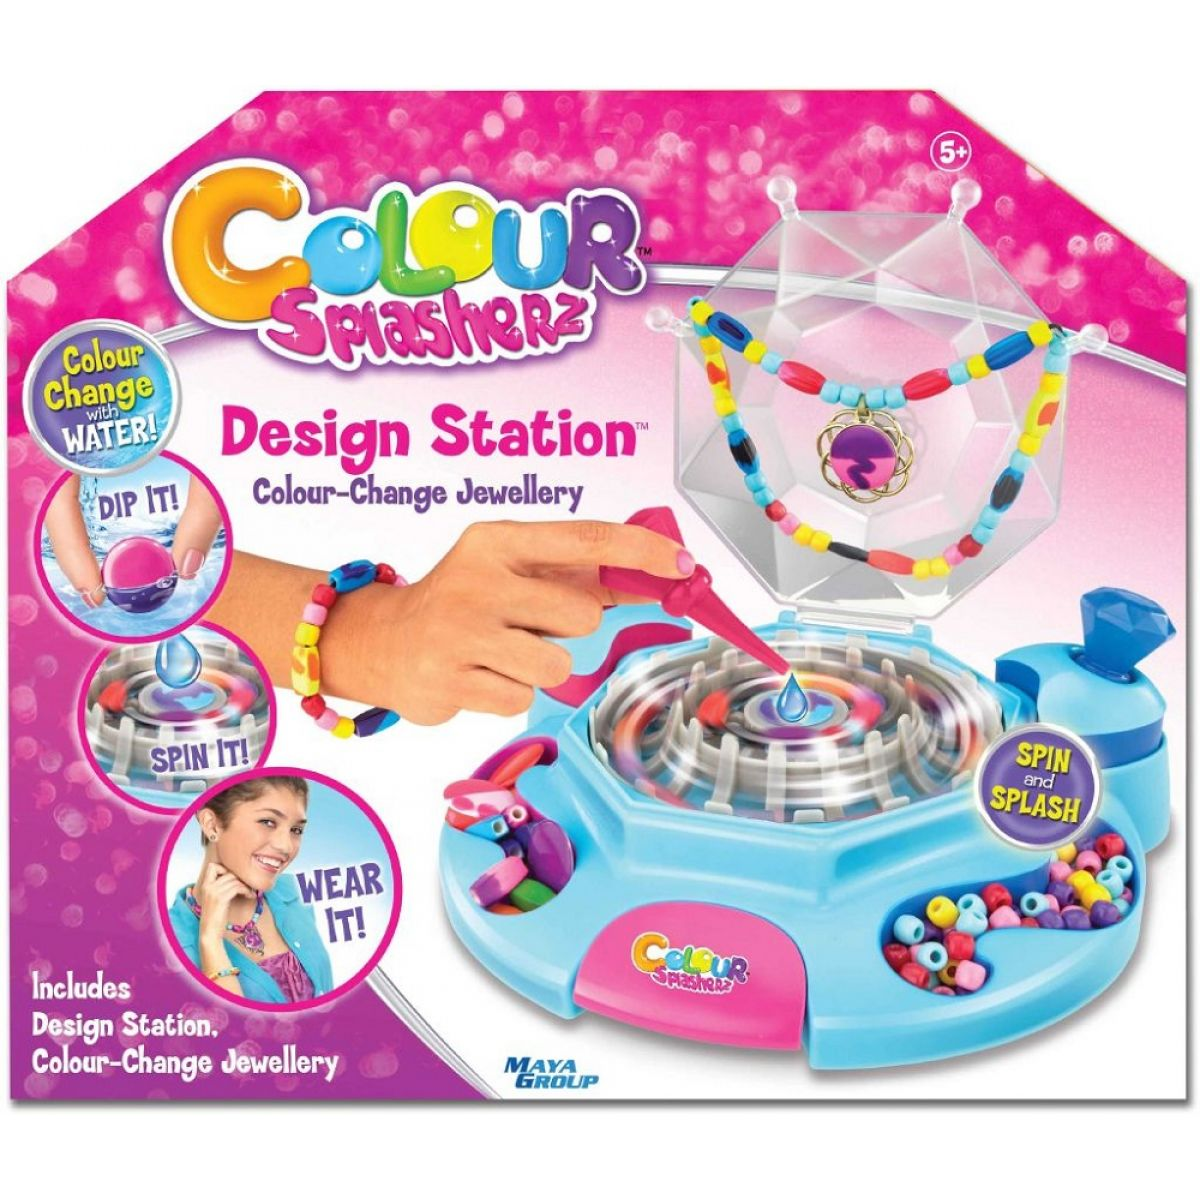 Colour Splasherz design studio